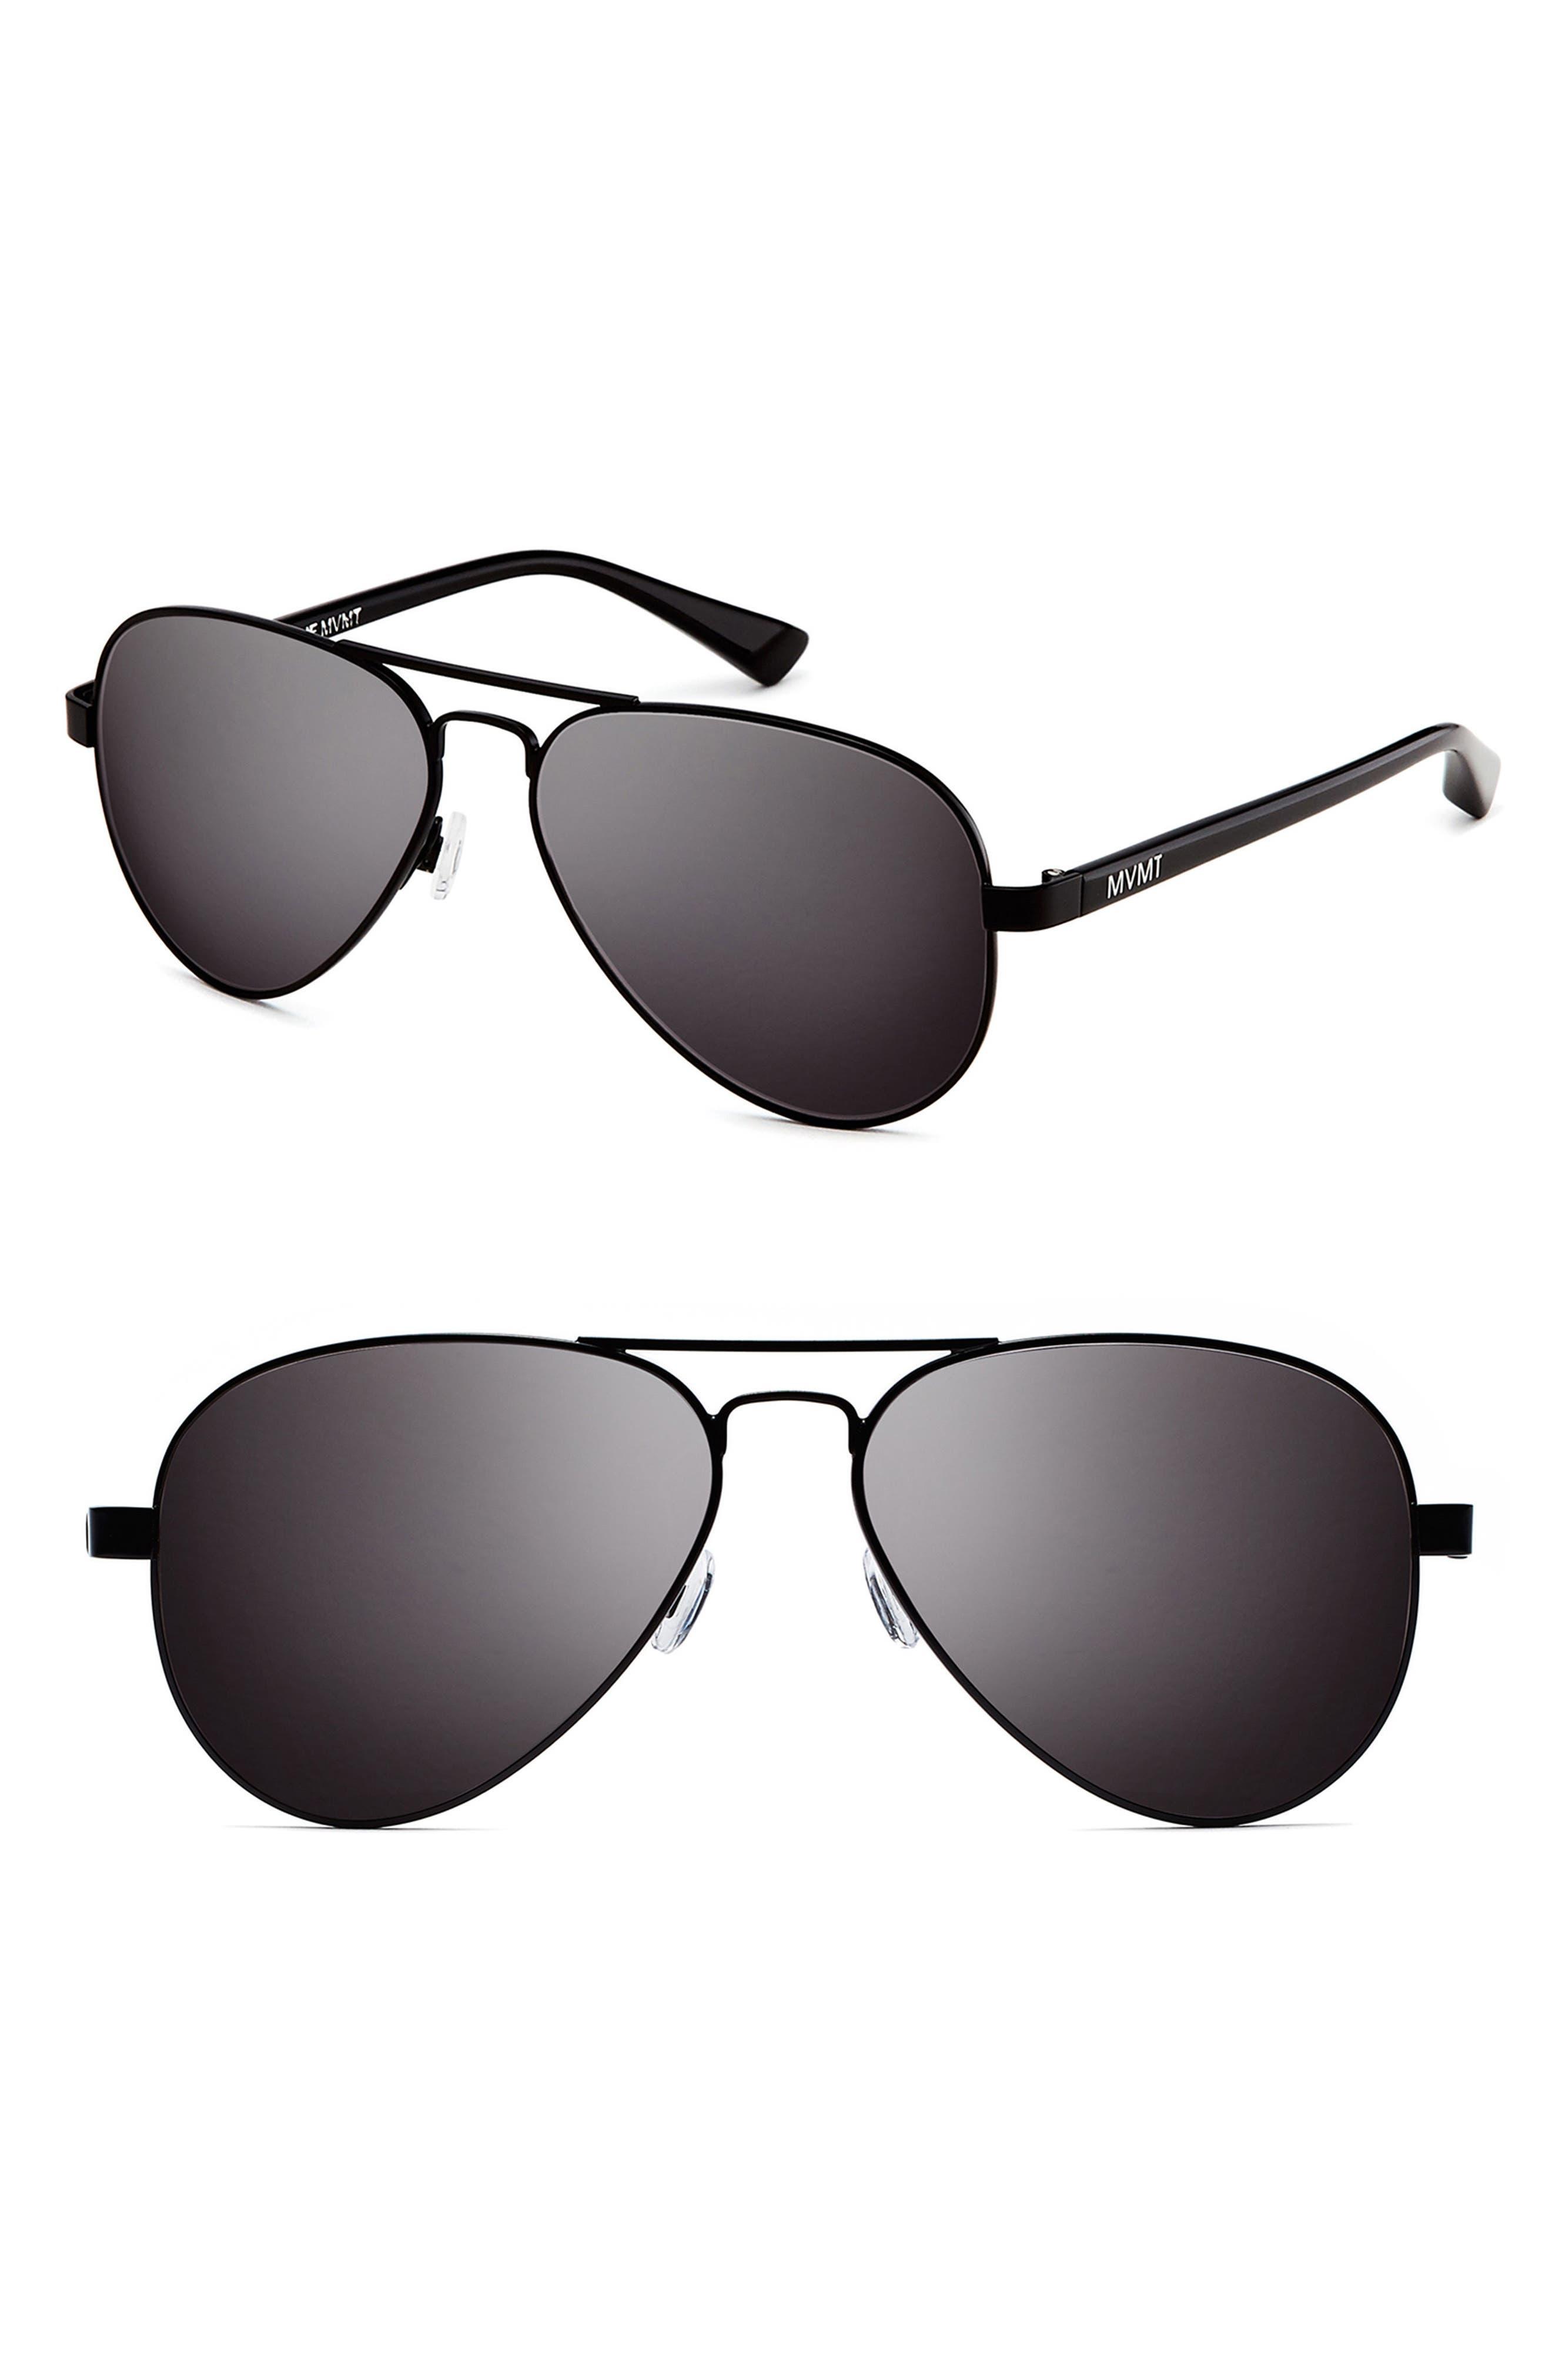 Runway 60mm Polarized Aviator Sunglasses,                         Main,                         color, MATTE BLACK